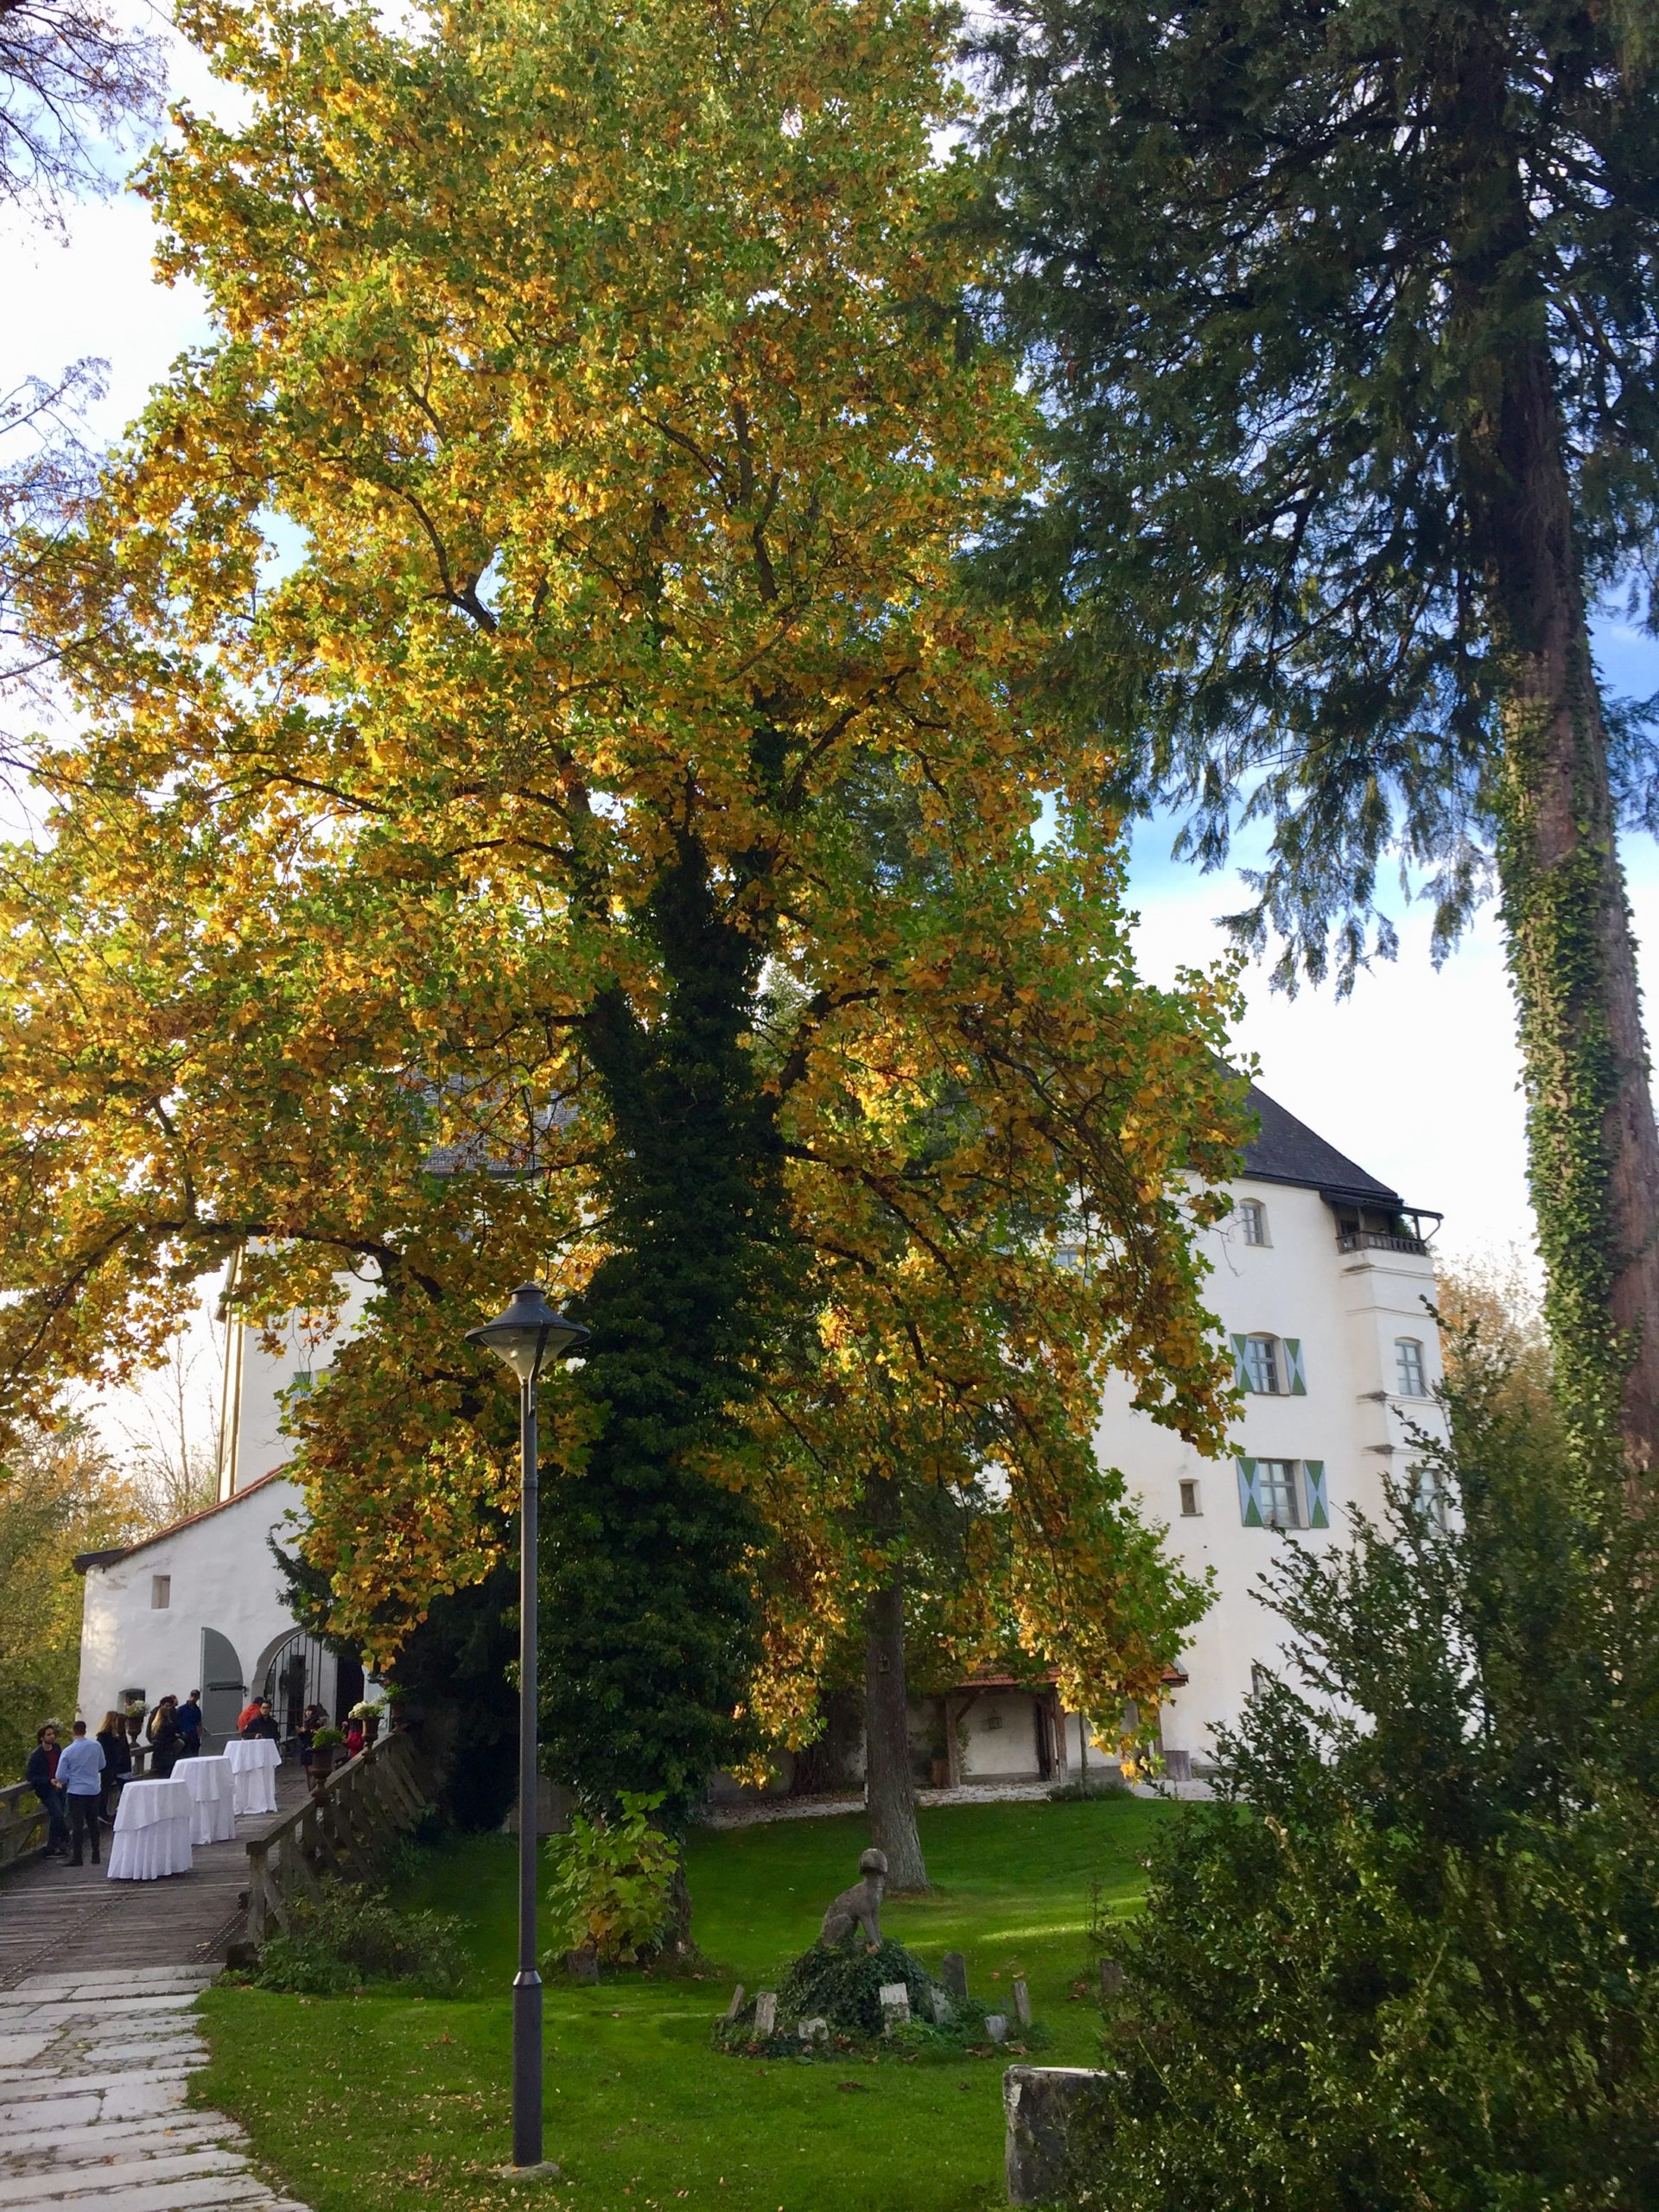 Opern-Festspiele auf Schloss Amerang 17